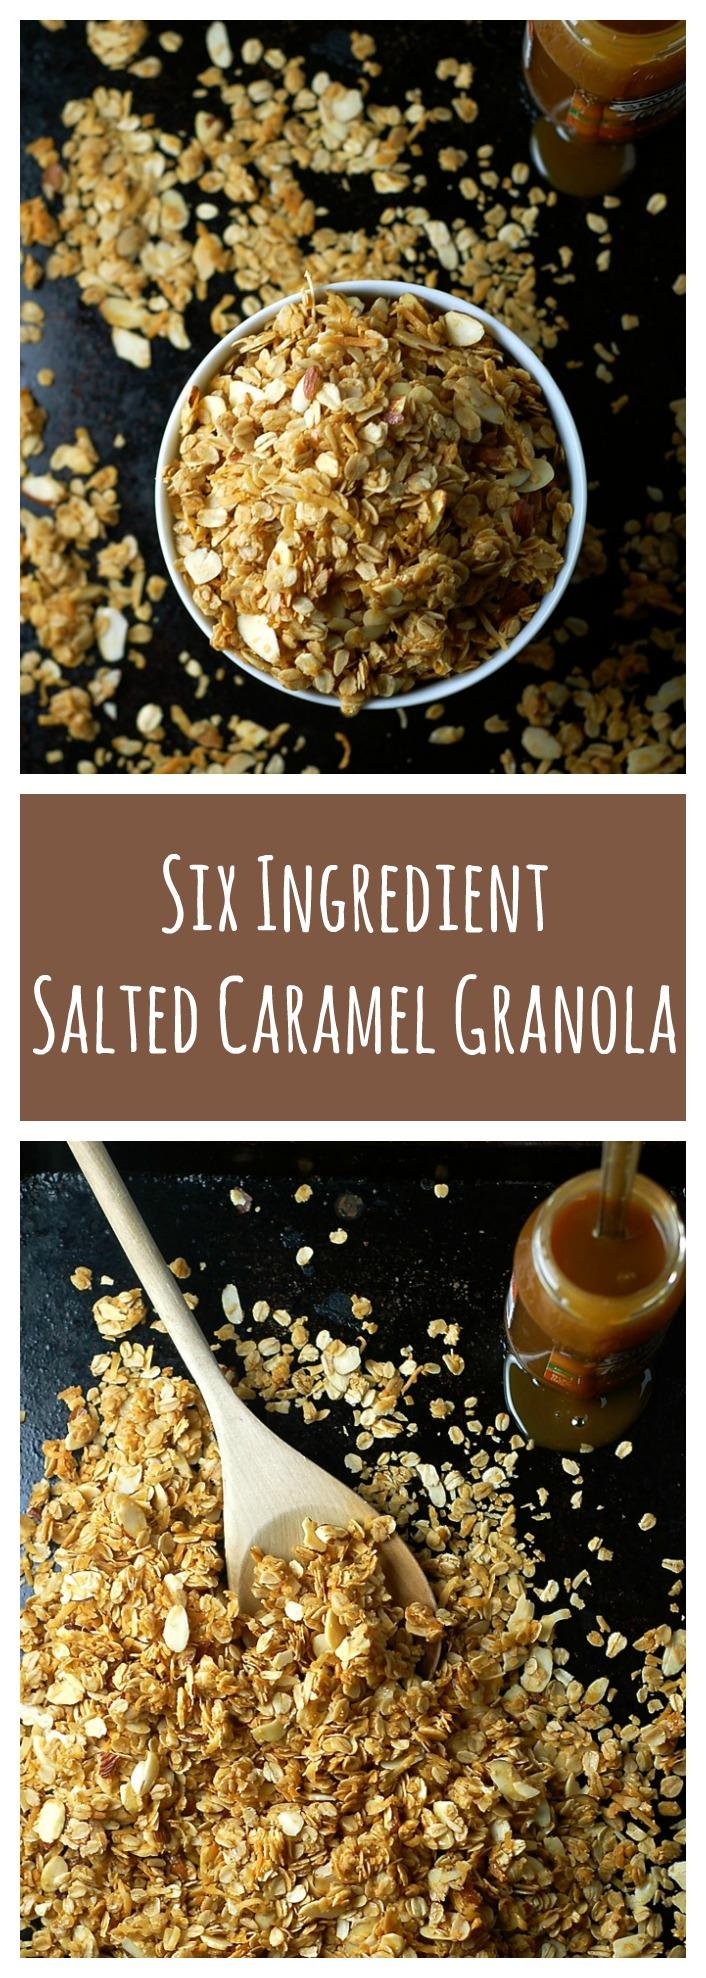 salted caramel granola